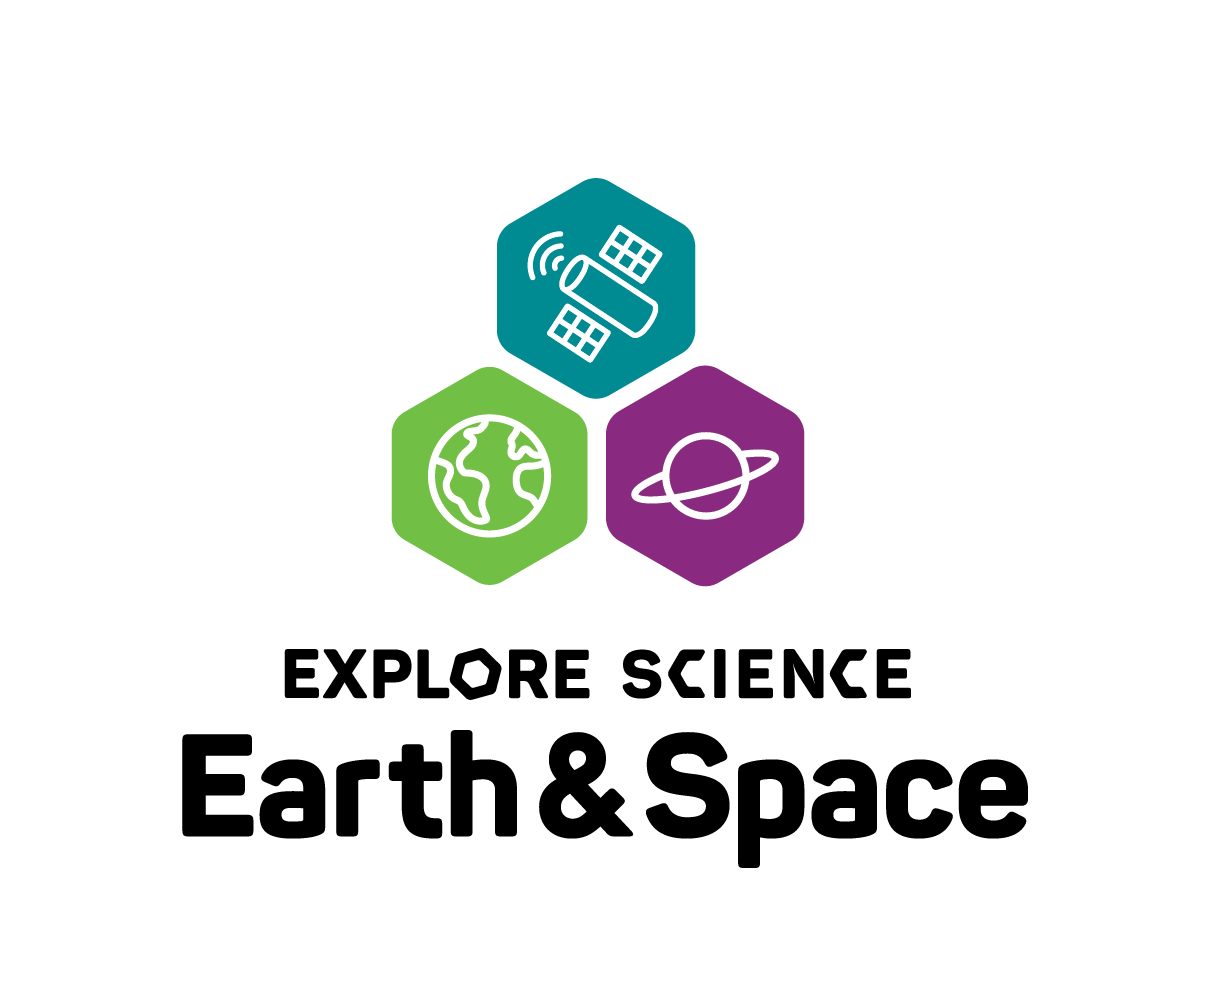 Explore Science Earth & Space logo